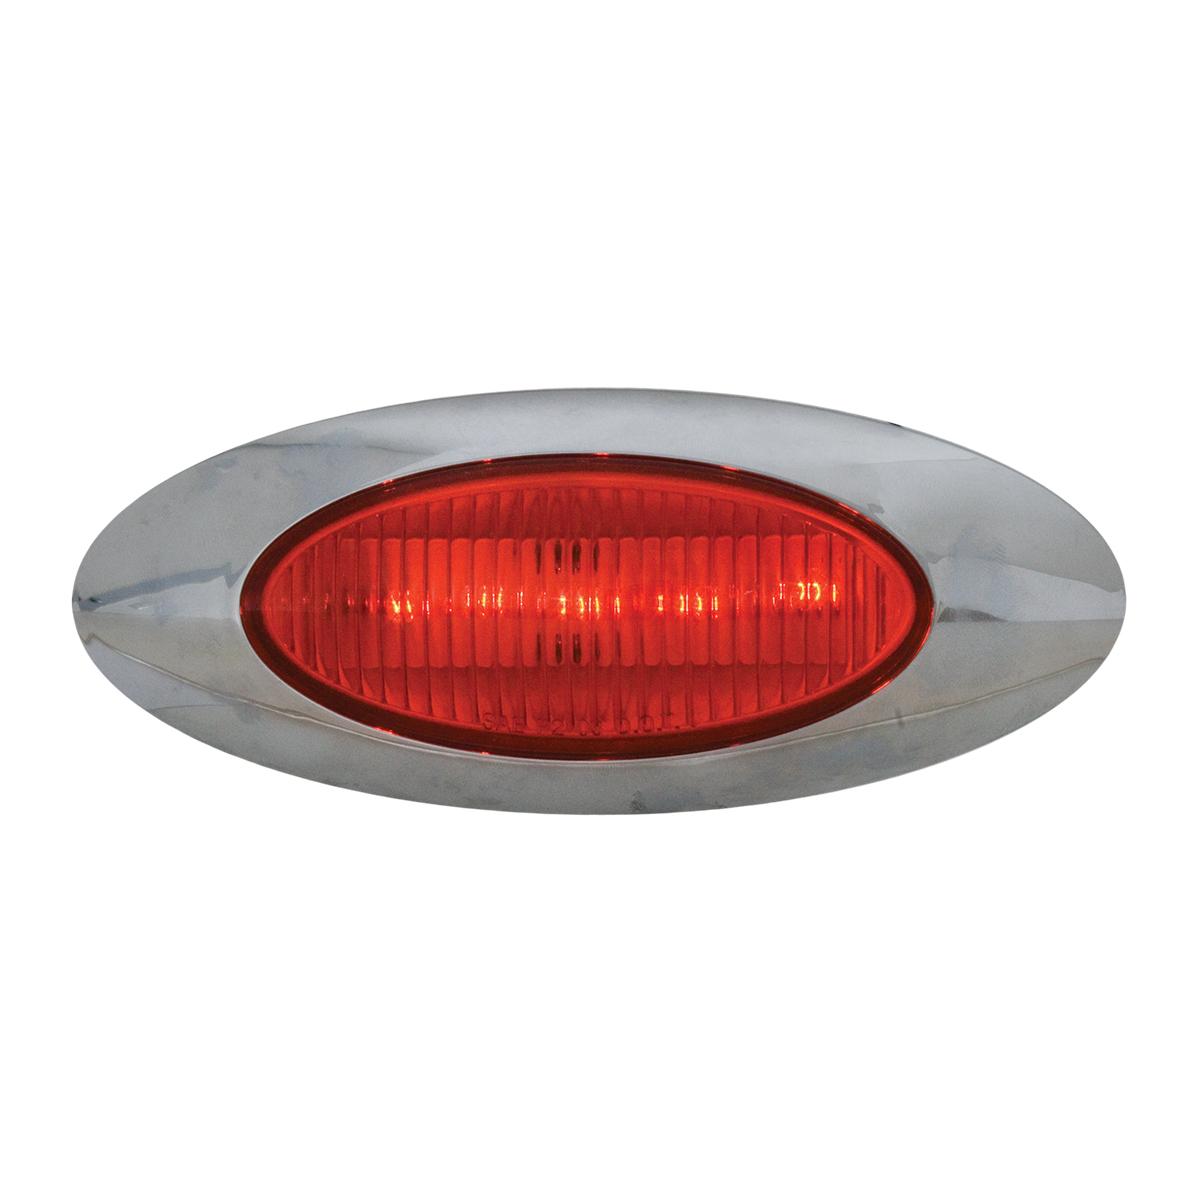 #79465 Plug In Y2K Marker Red Light - 5 Bulbs